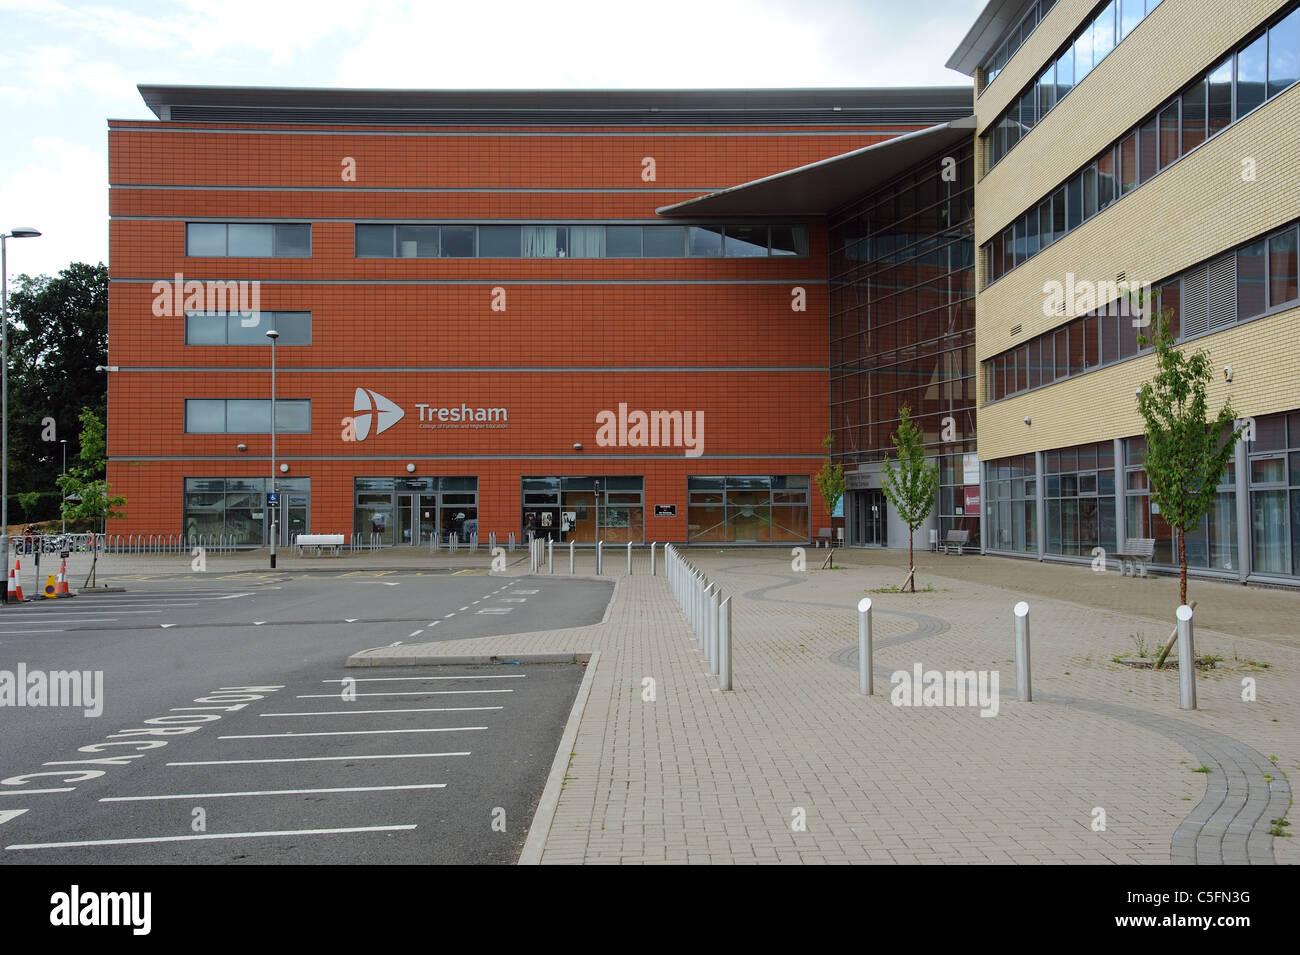 Tresham College of Further & Higher Education Kettering Northamptonshire England UK - Stock Image